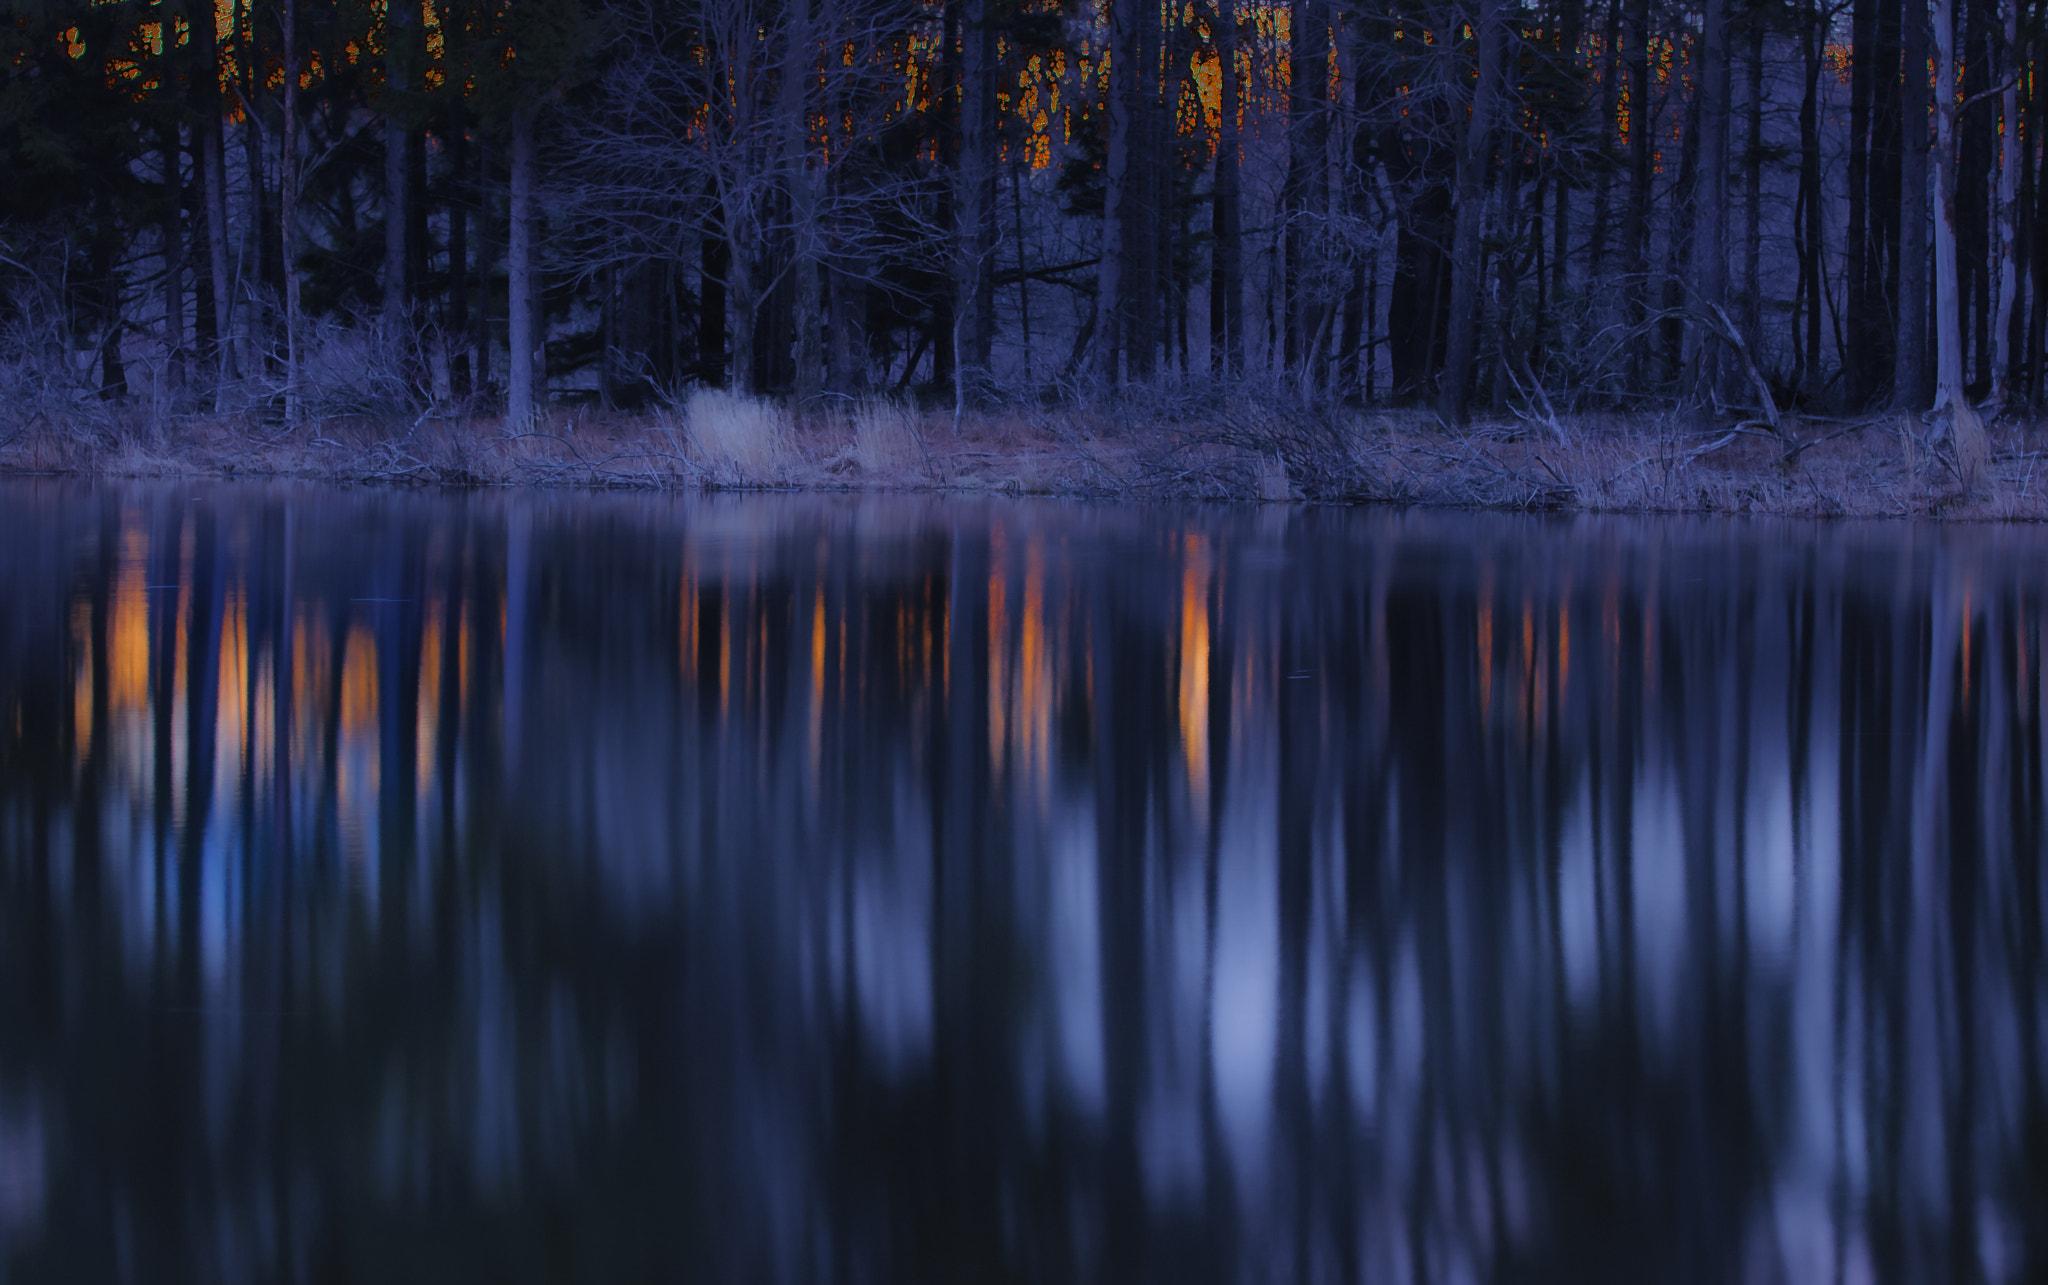 Morning Glow on Pond